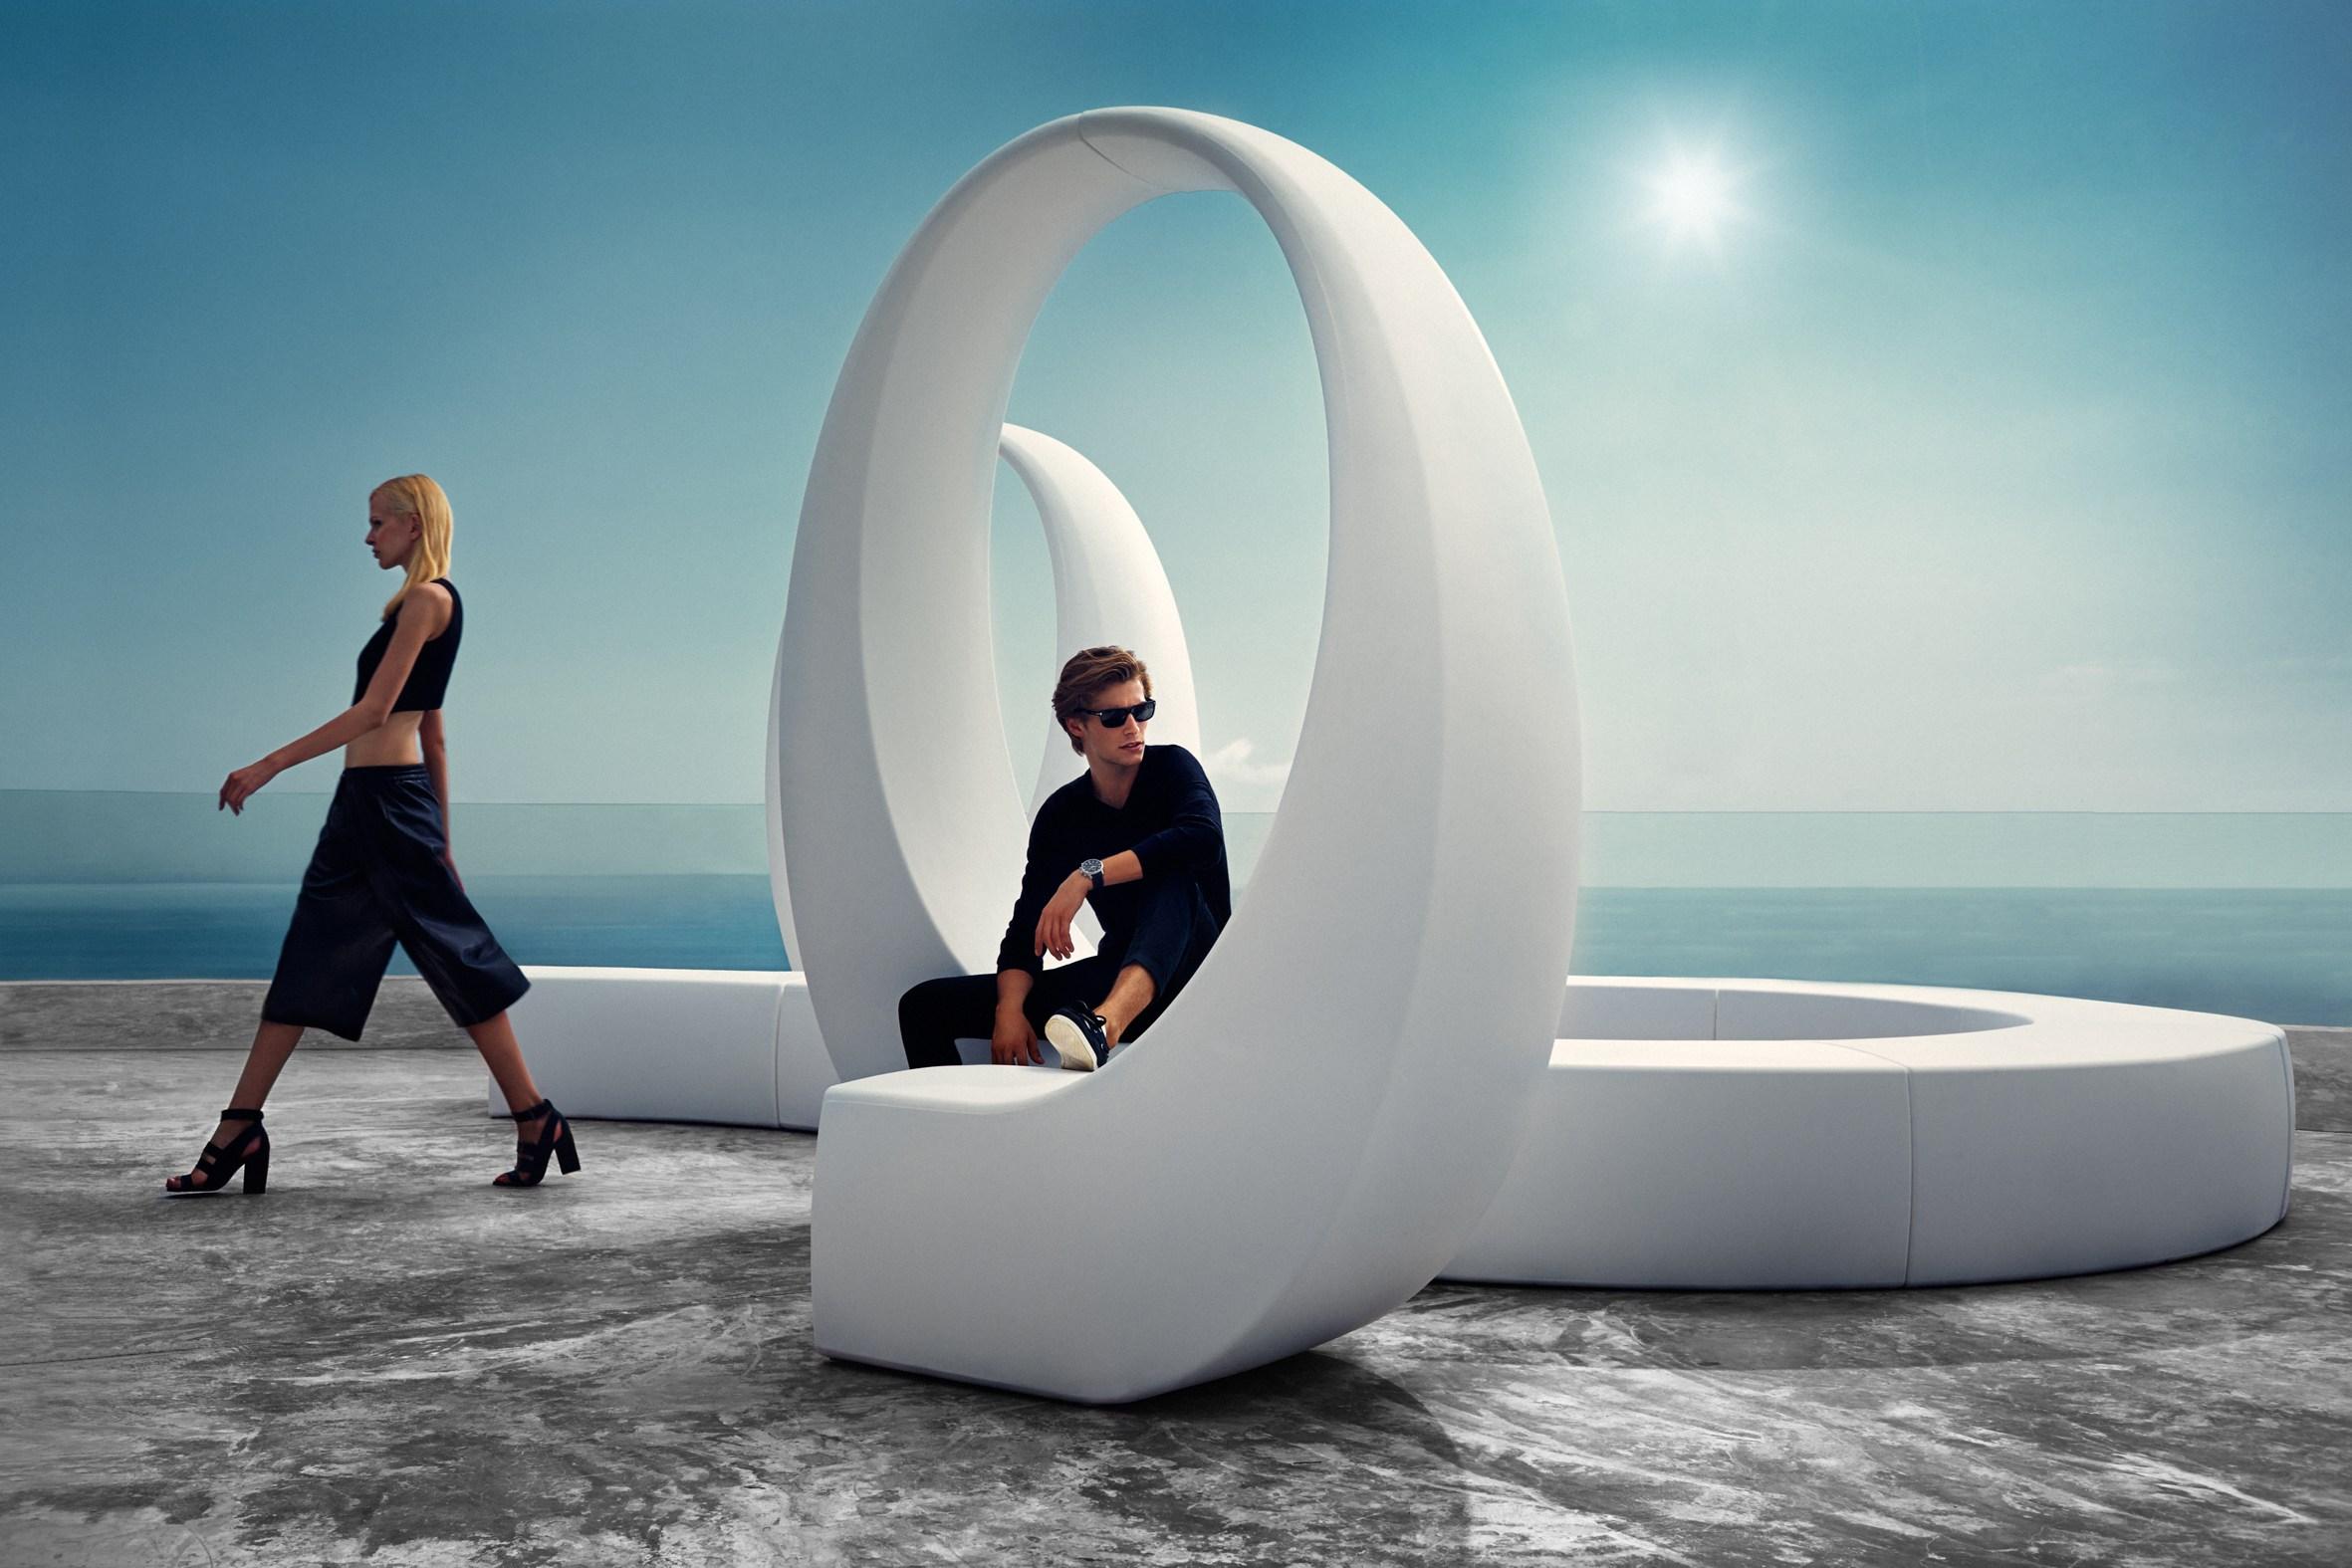 Banc Exterieur Design #14: BANC MODULAIRE DESIGN Prodotti-135384-rel0a186bf131dc4b22a33eb4a56f1a0098  ...